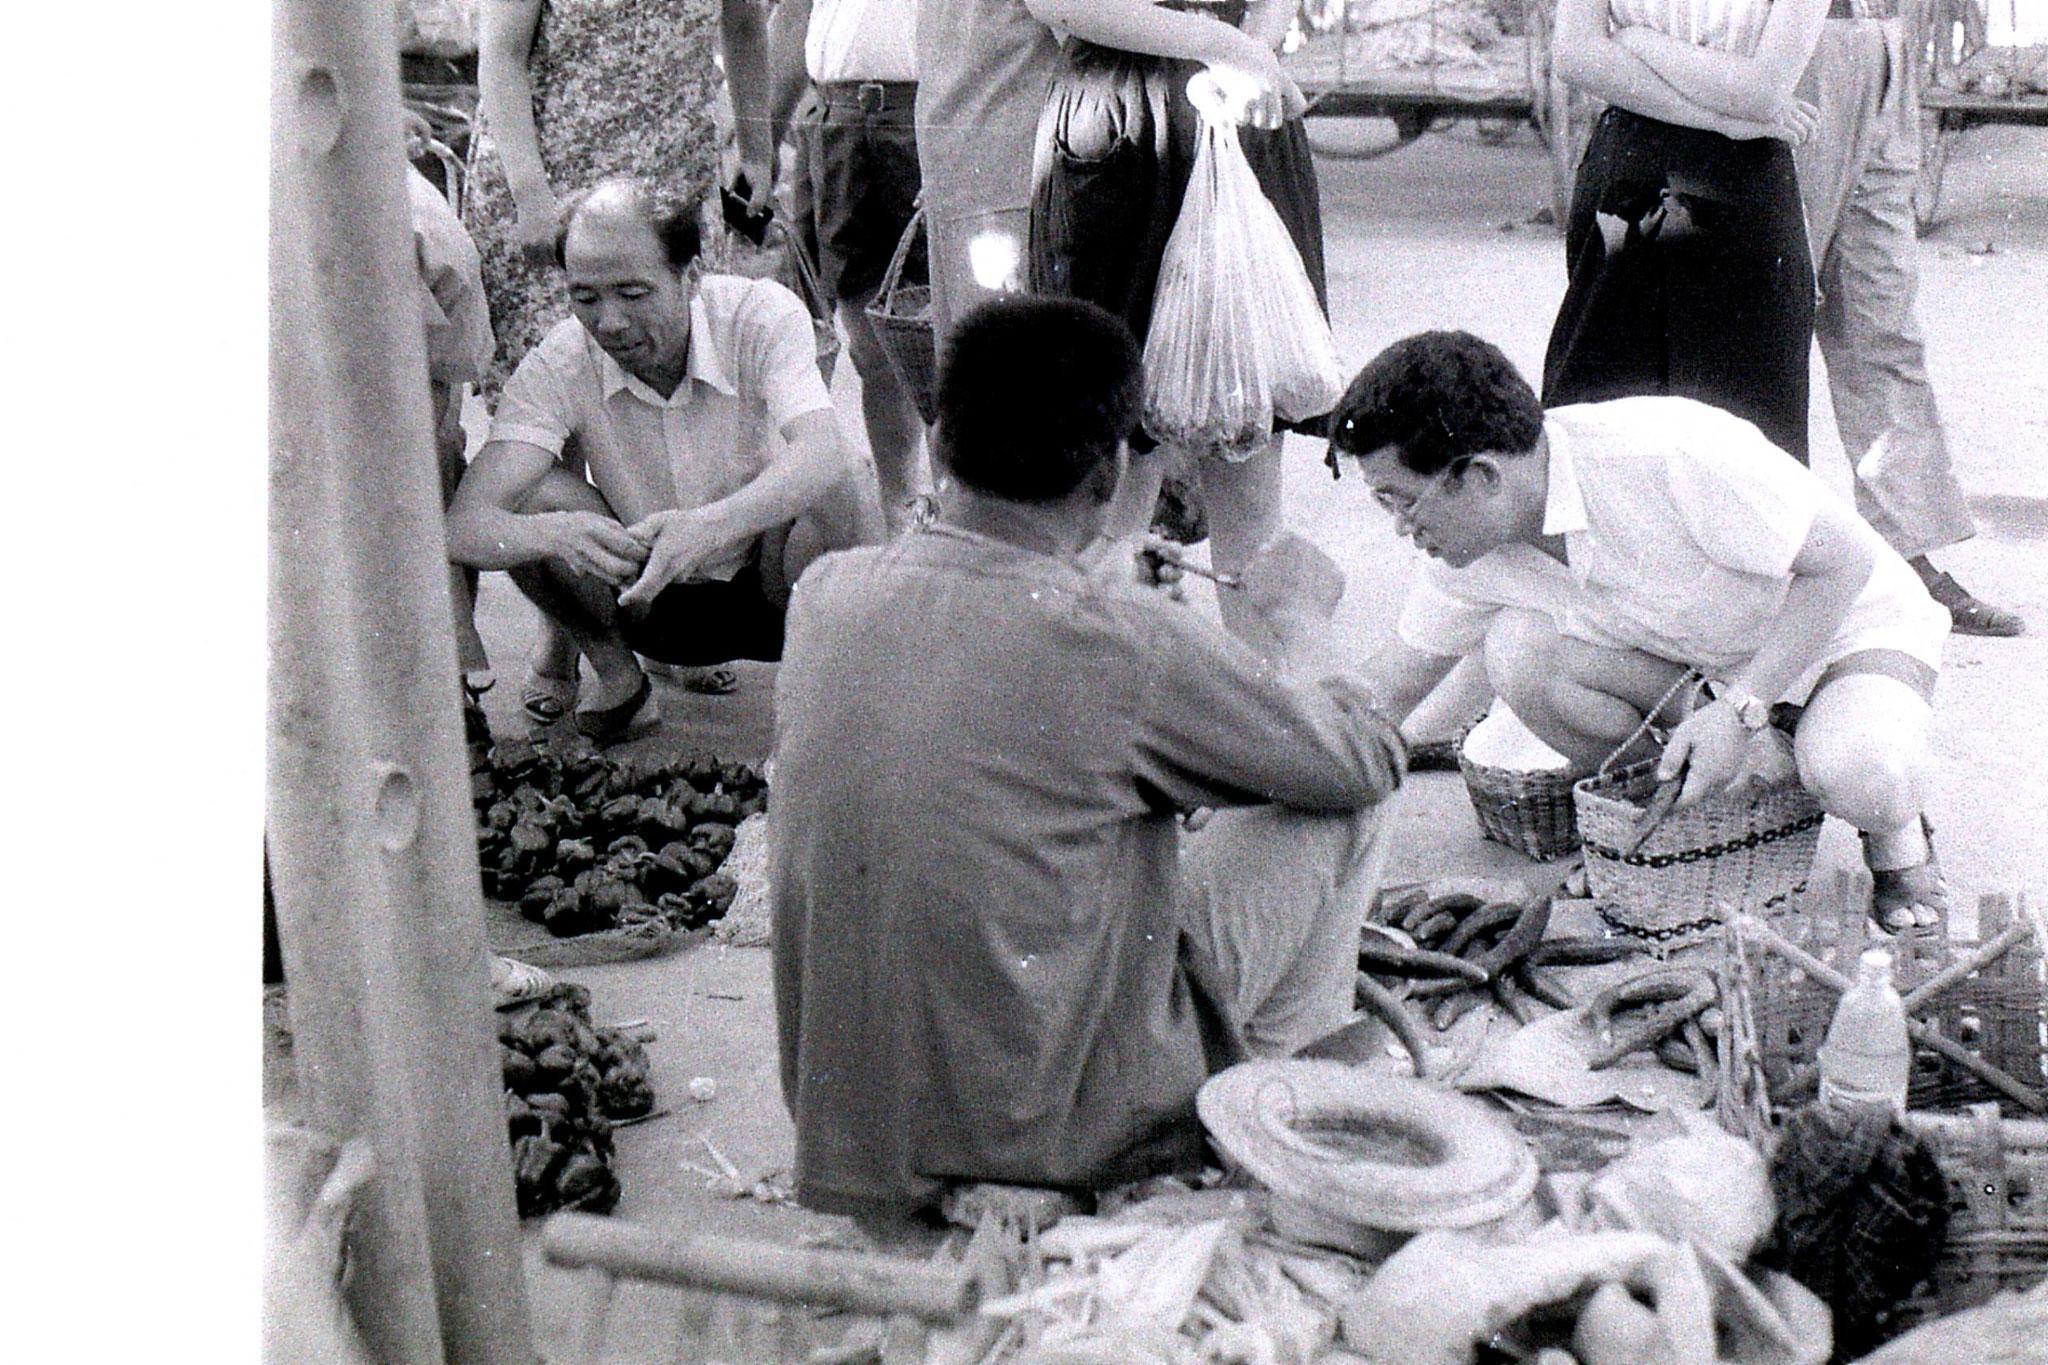 19/7/1989: 15: Zheda Free market